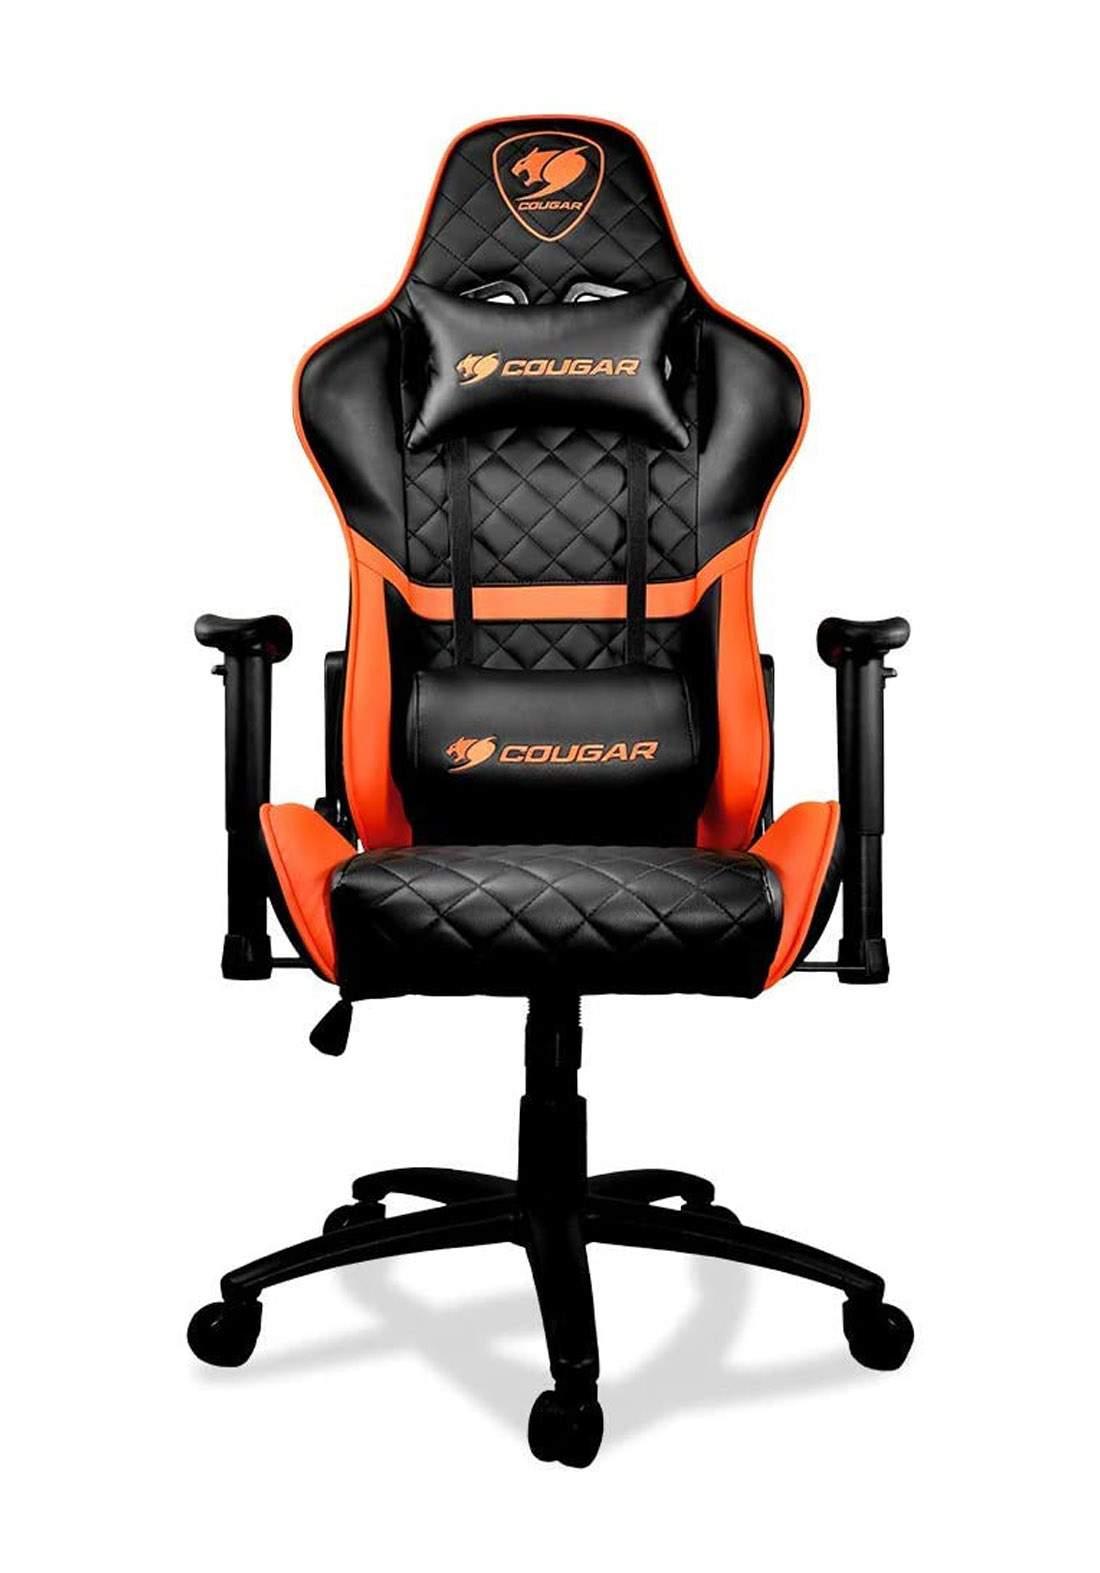 Cougar Armor One Gaming Chair - Black and Orange  كرسي العاب